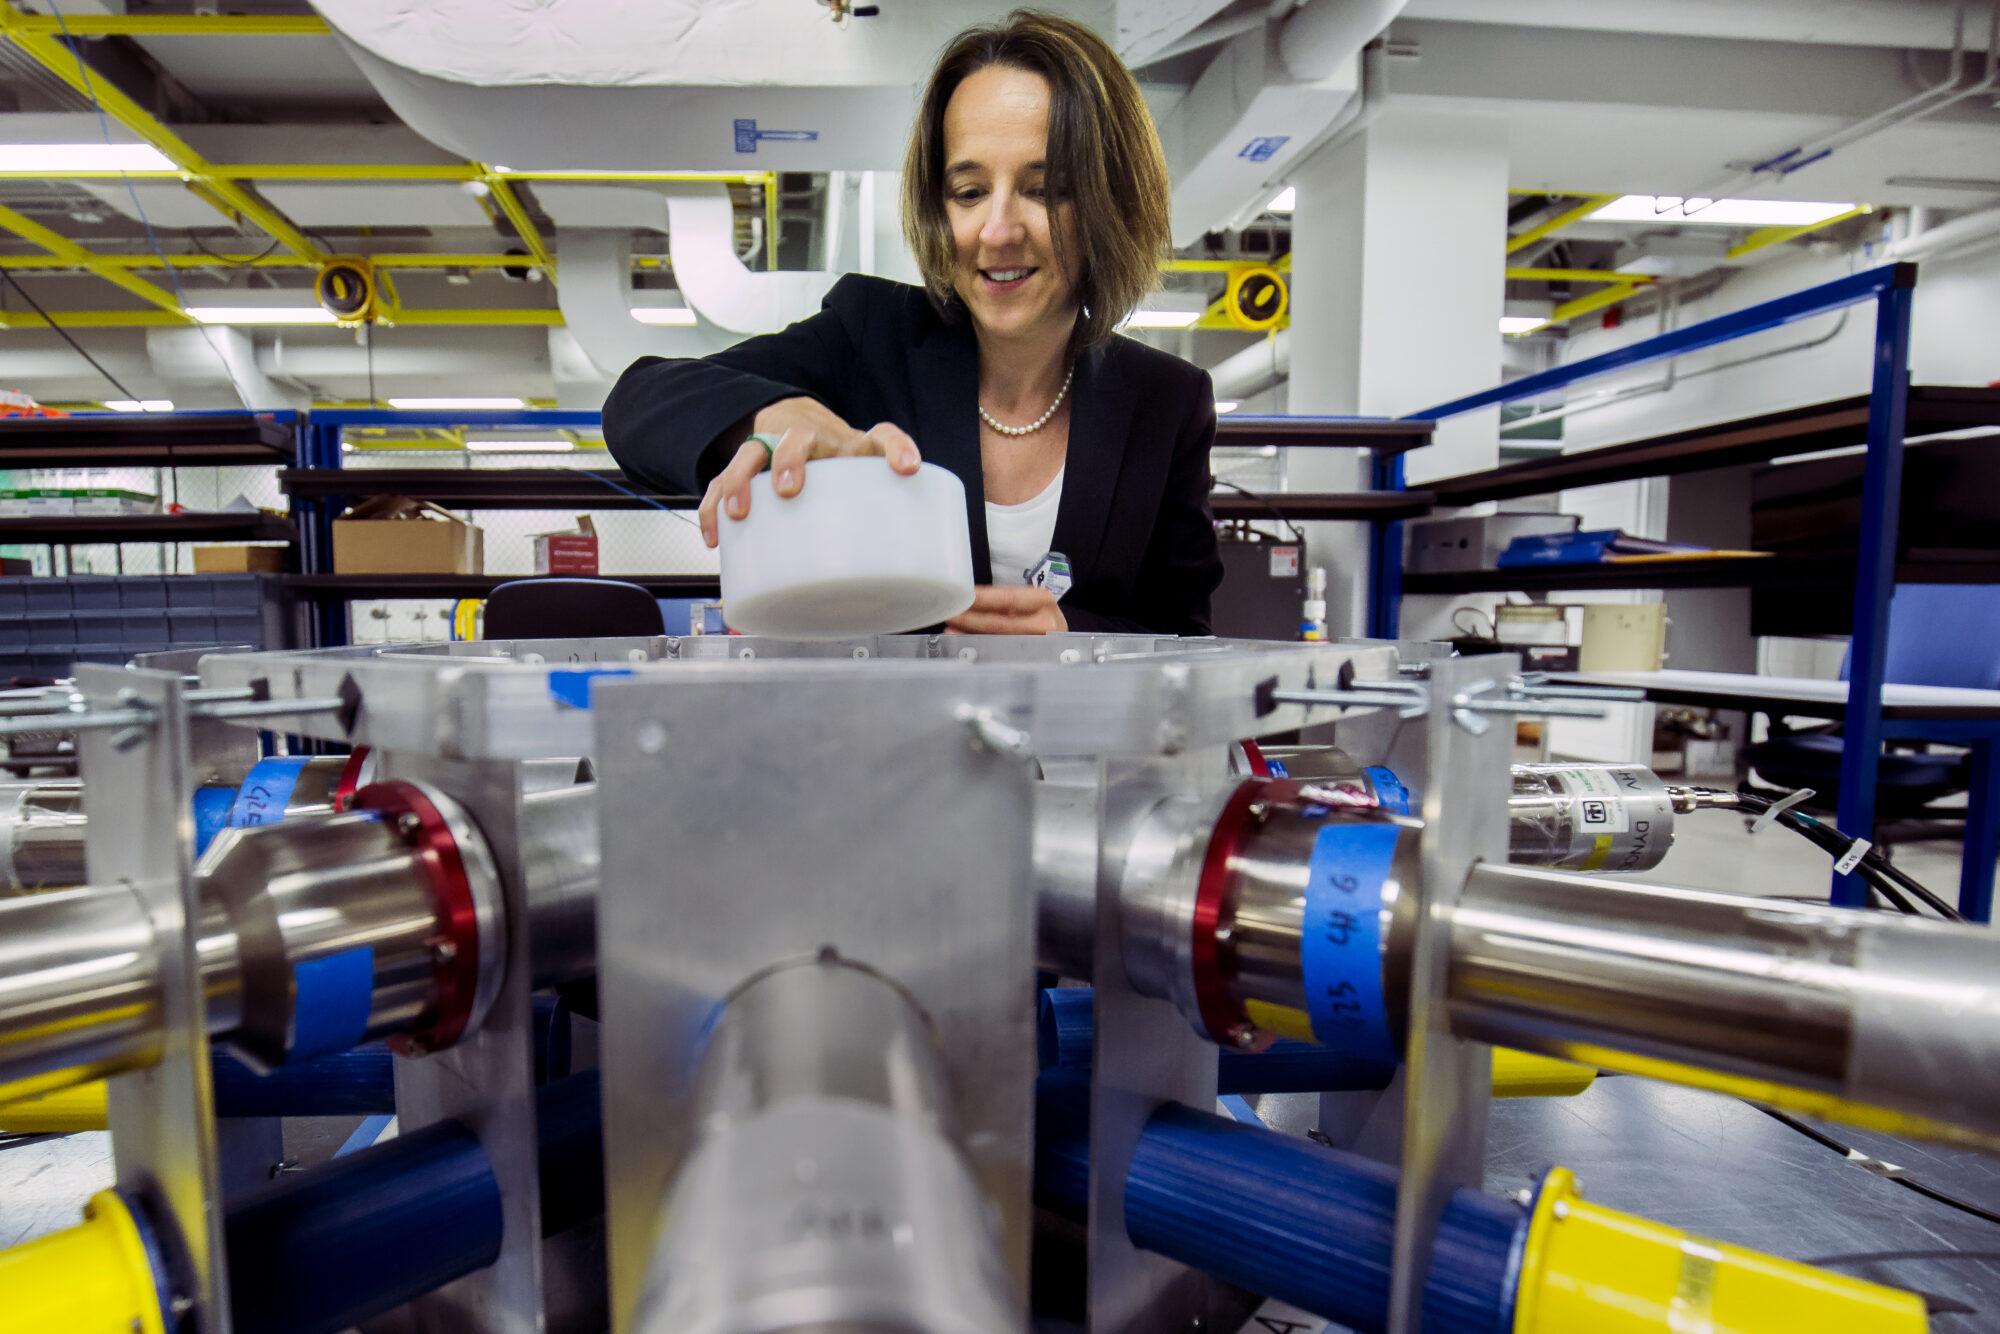 Sara Pozzi puts a radioactive sample into an array of detectors that identify and measure uranium and plutonium. Image credit: Joseph Xu, Michigan Engineering